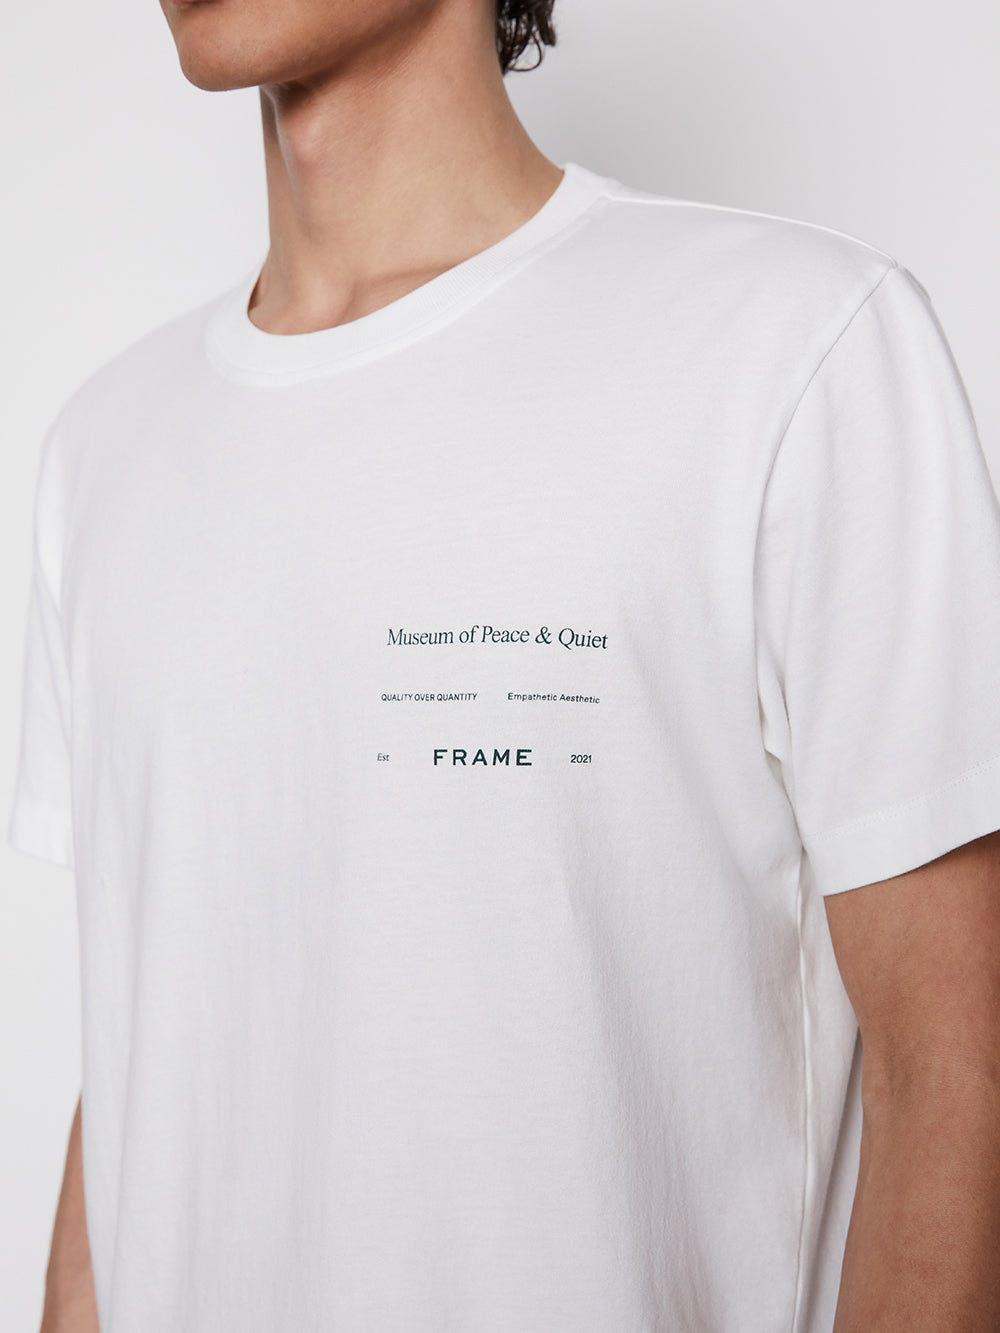 shirt detail view